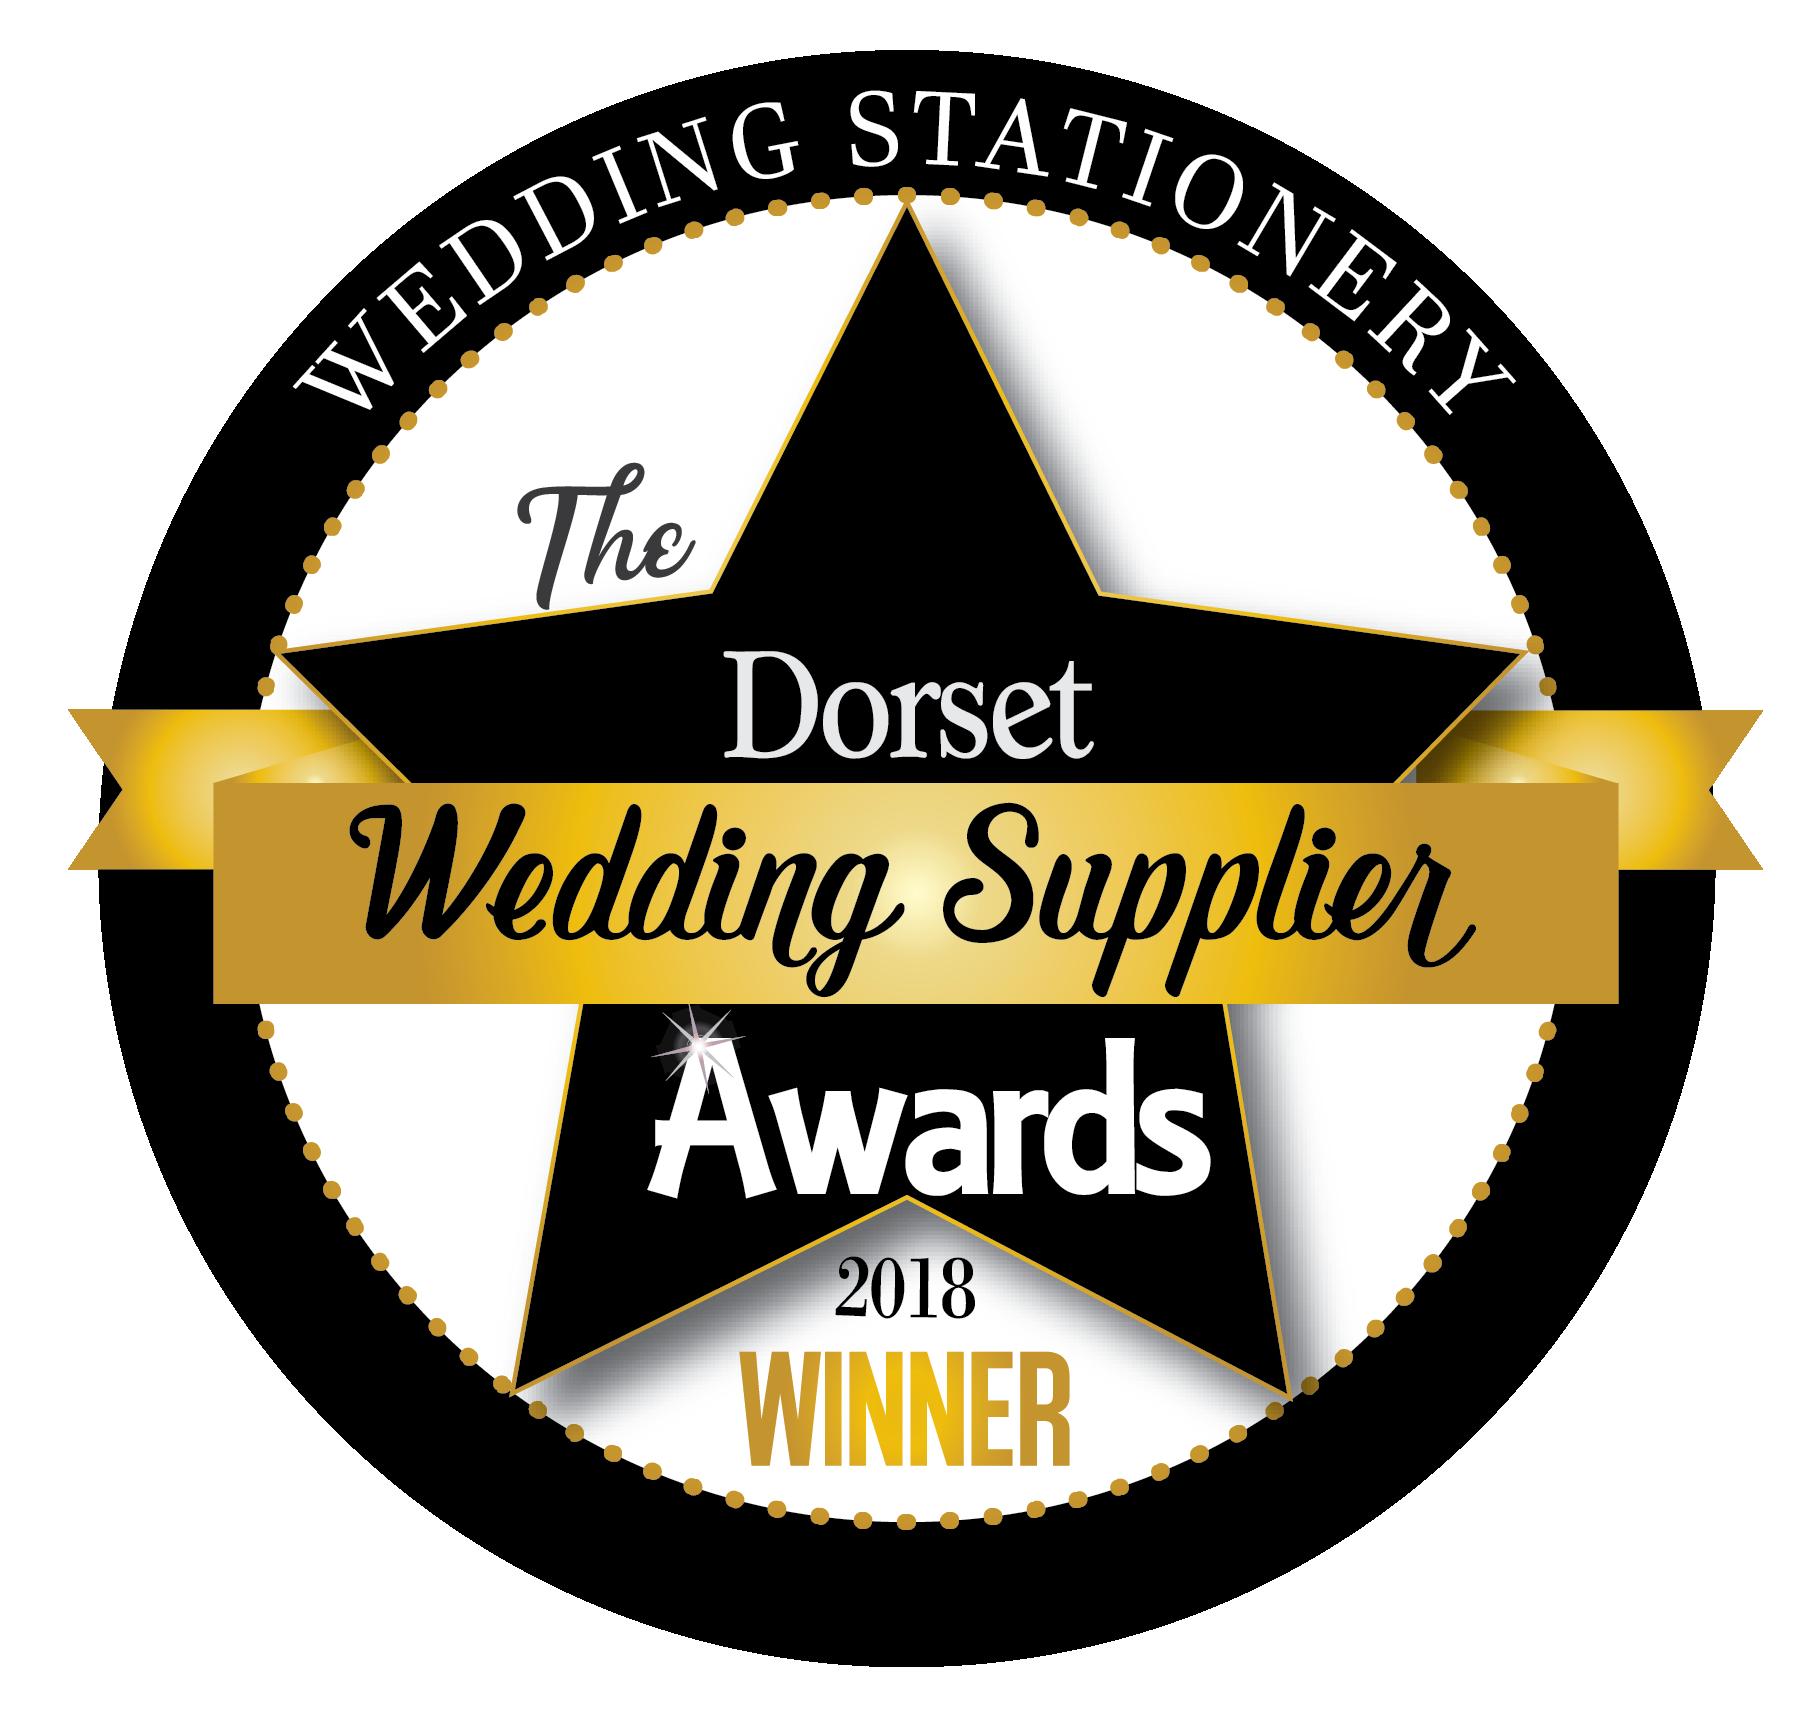 The Dorset Wedding Supplier Awards | Stationery Winner 2018